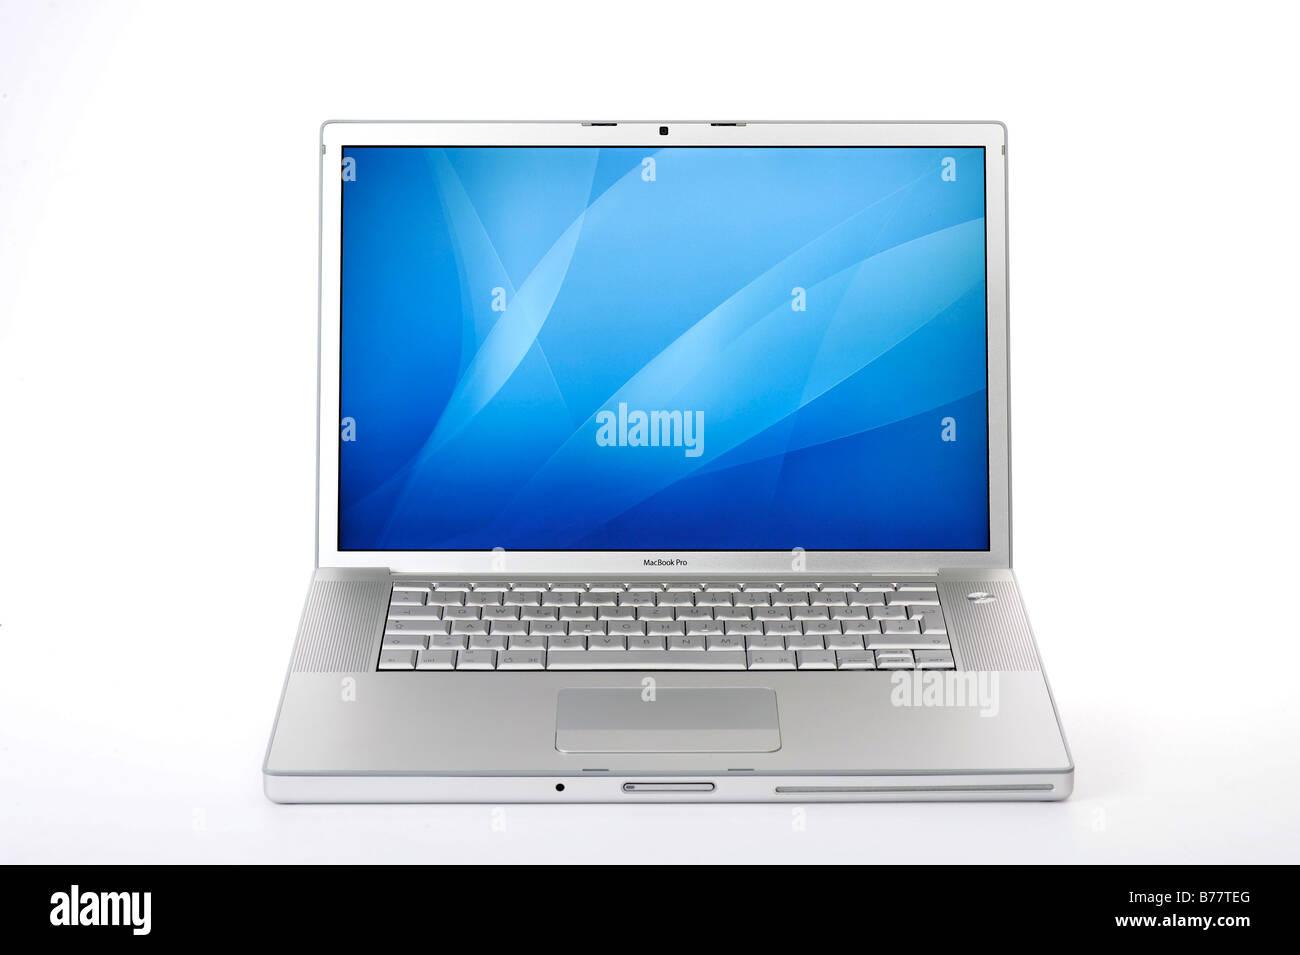 Amazing Wallpaper Macbook Blue - apple-macbook-pro-notebook-blue-screen-display-apple-wallpaper-B77TEG  HD_4097100.jpg